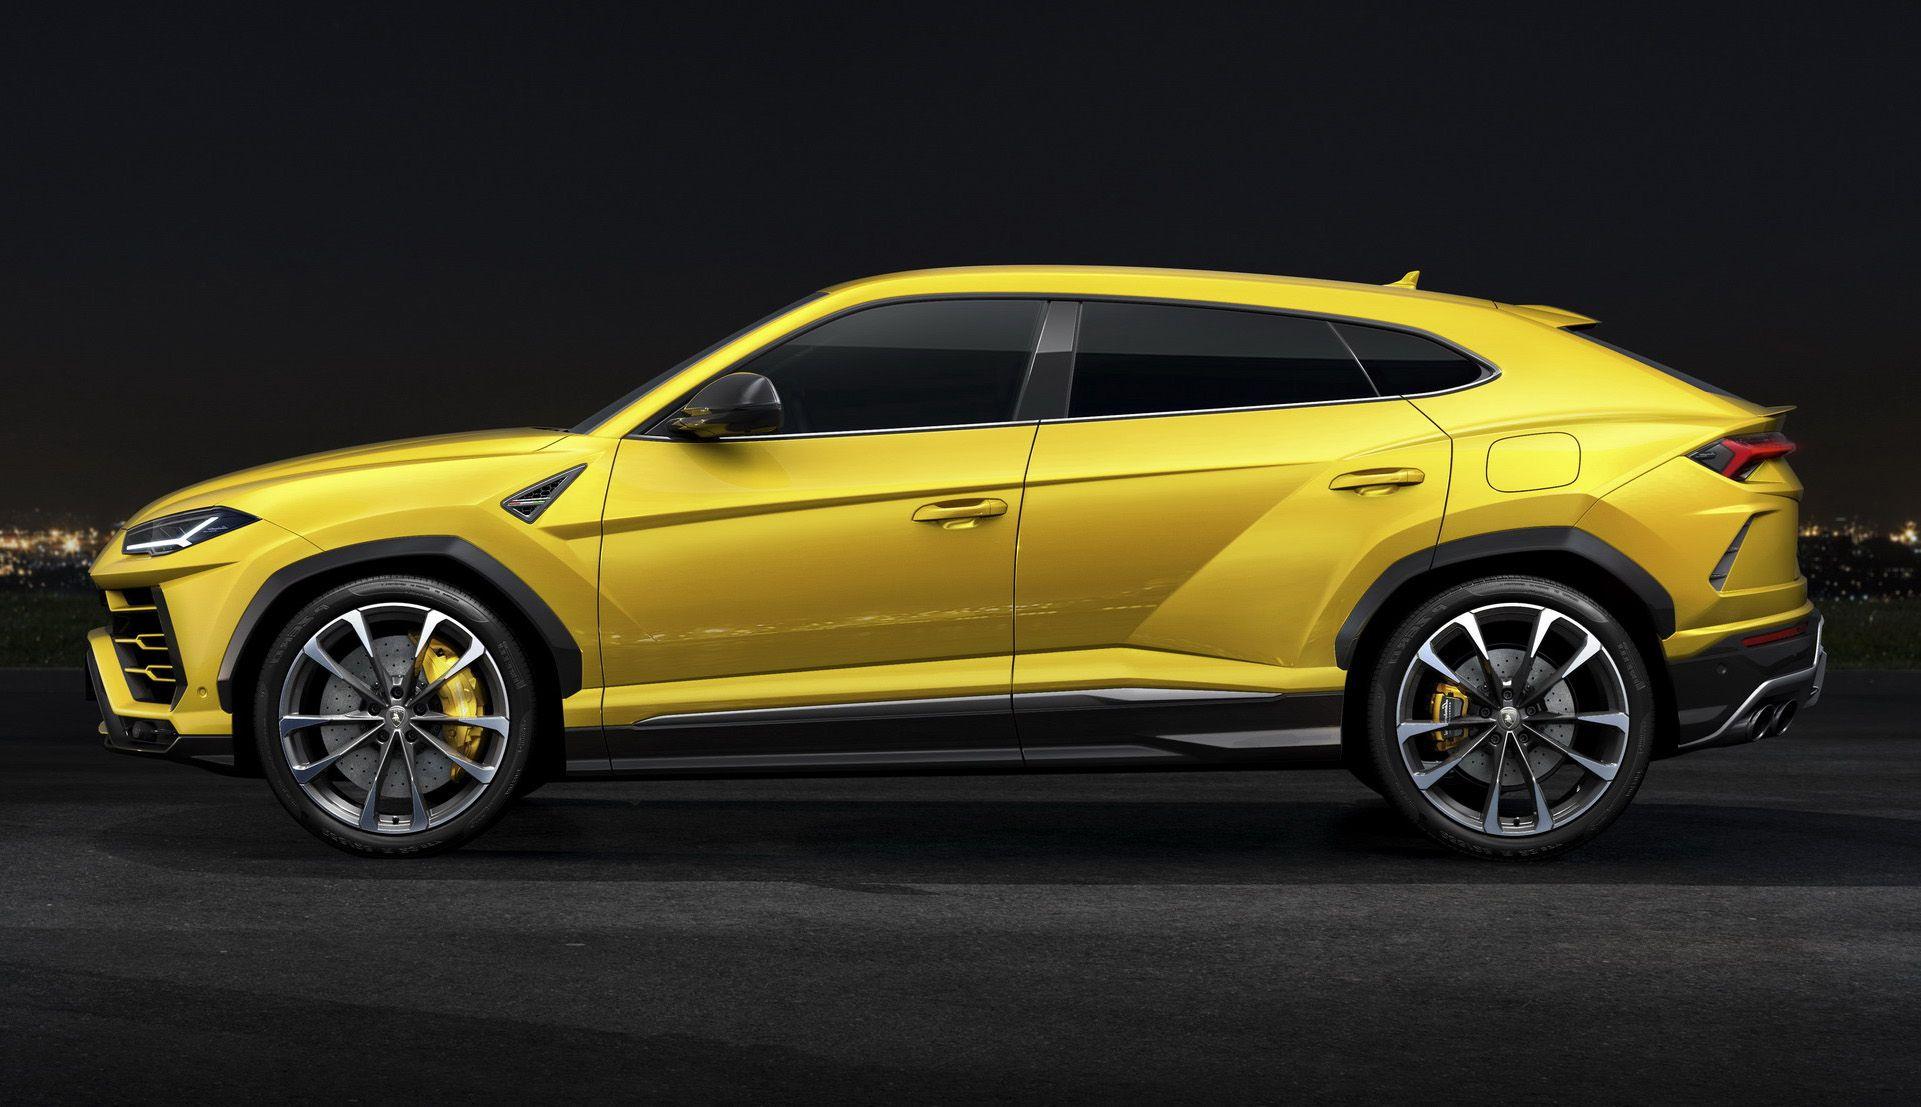 Huansu Hyosow C60: Chinas $15,000 Lamborghini Urus Clone Debuts In The Flesh  Carscoops